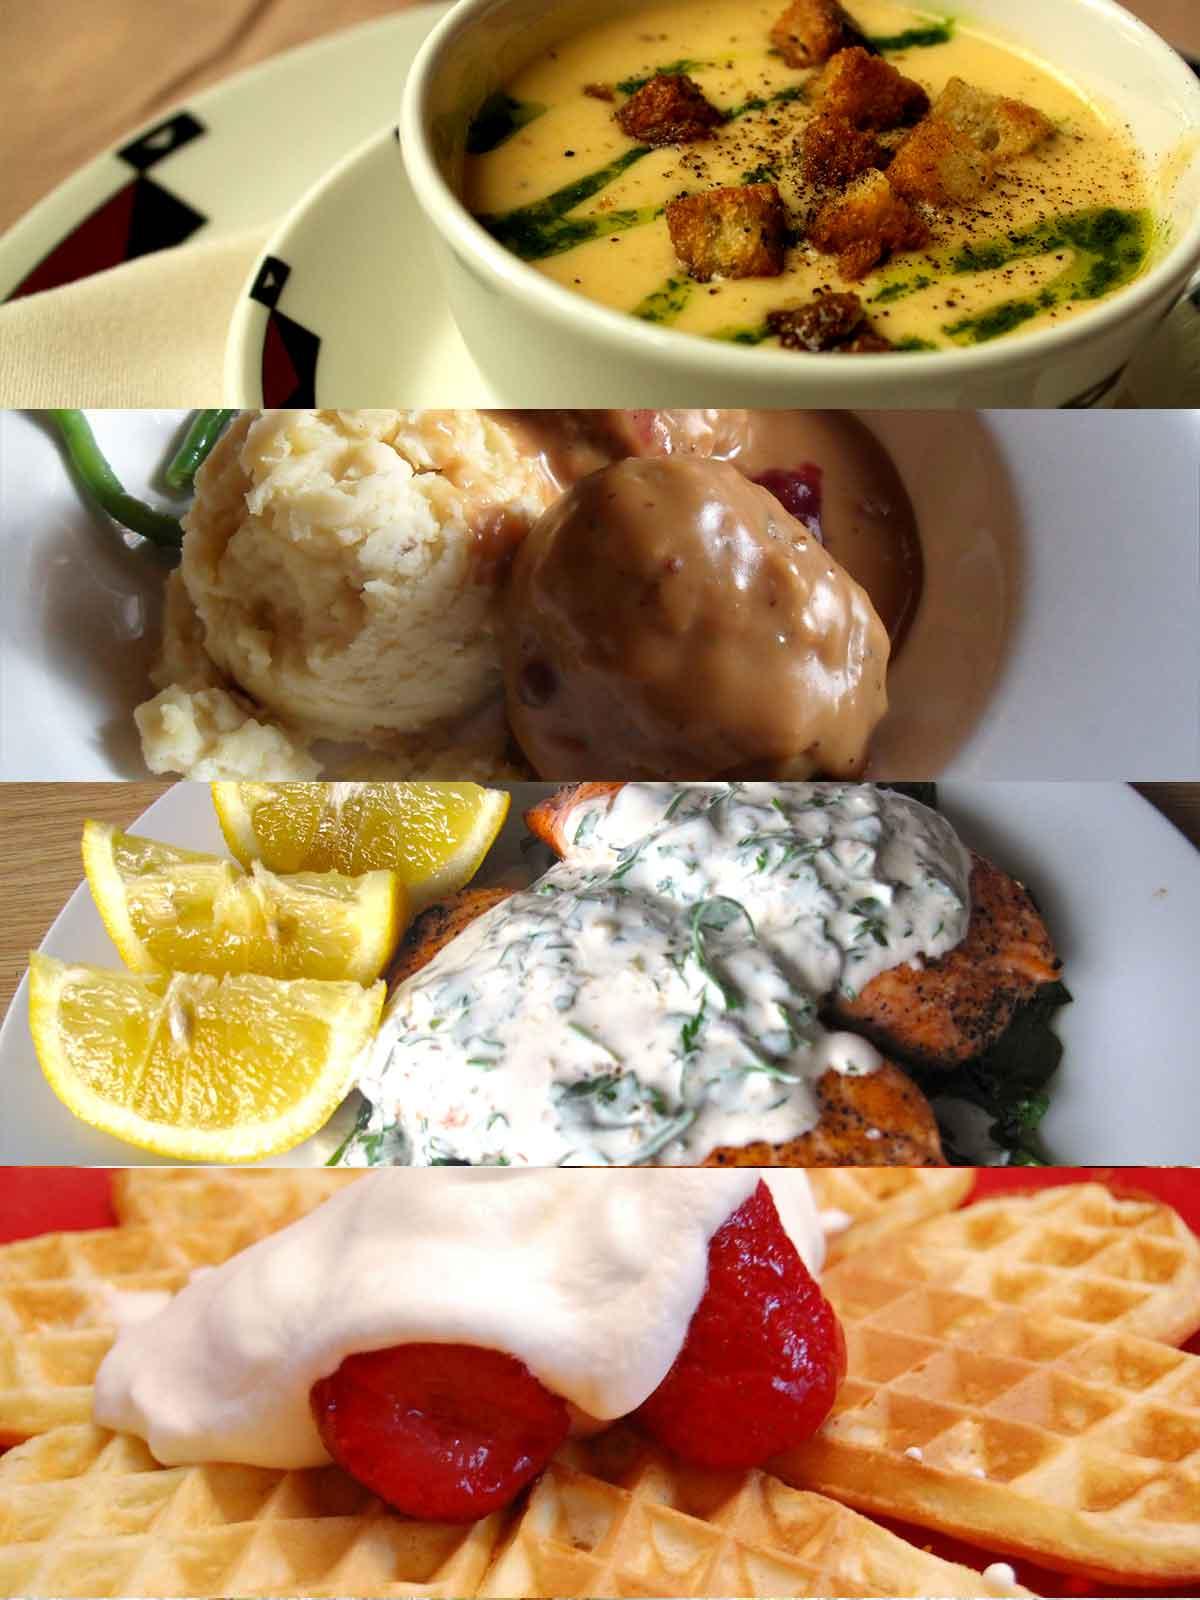 Collage of various Norwegian foods